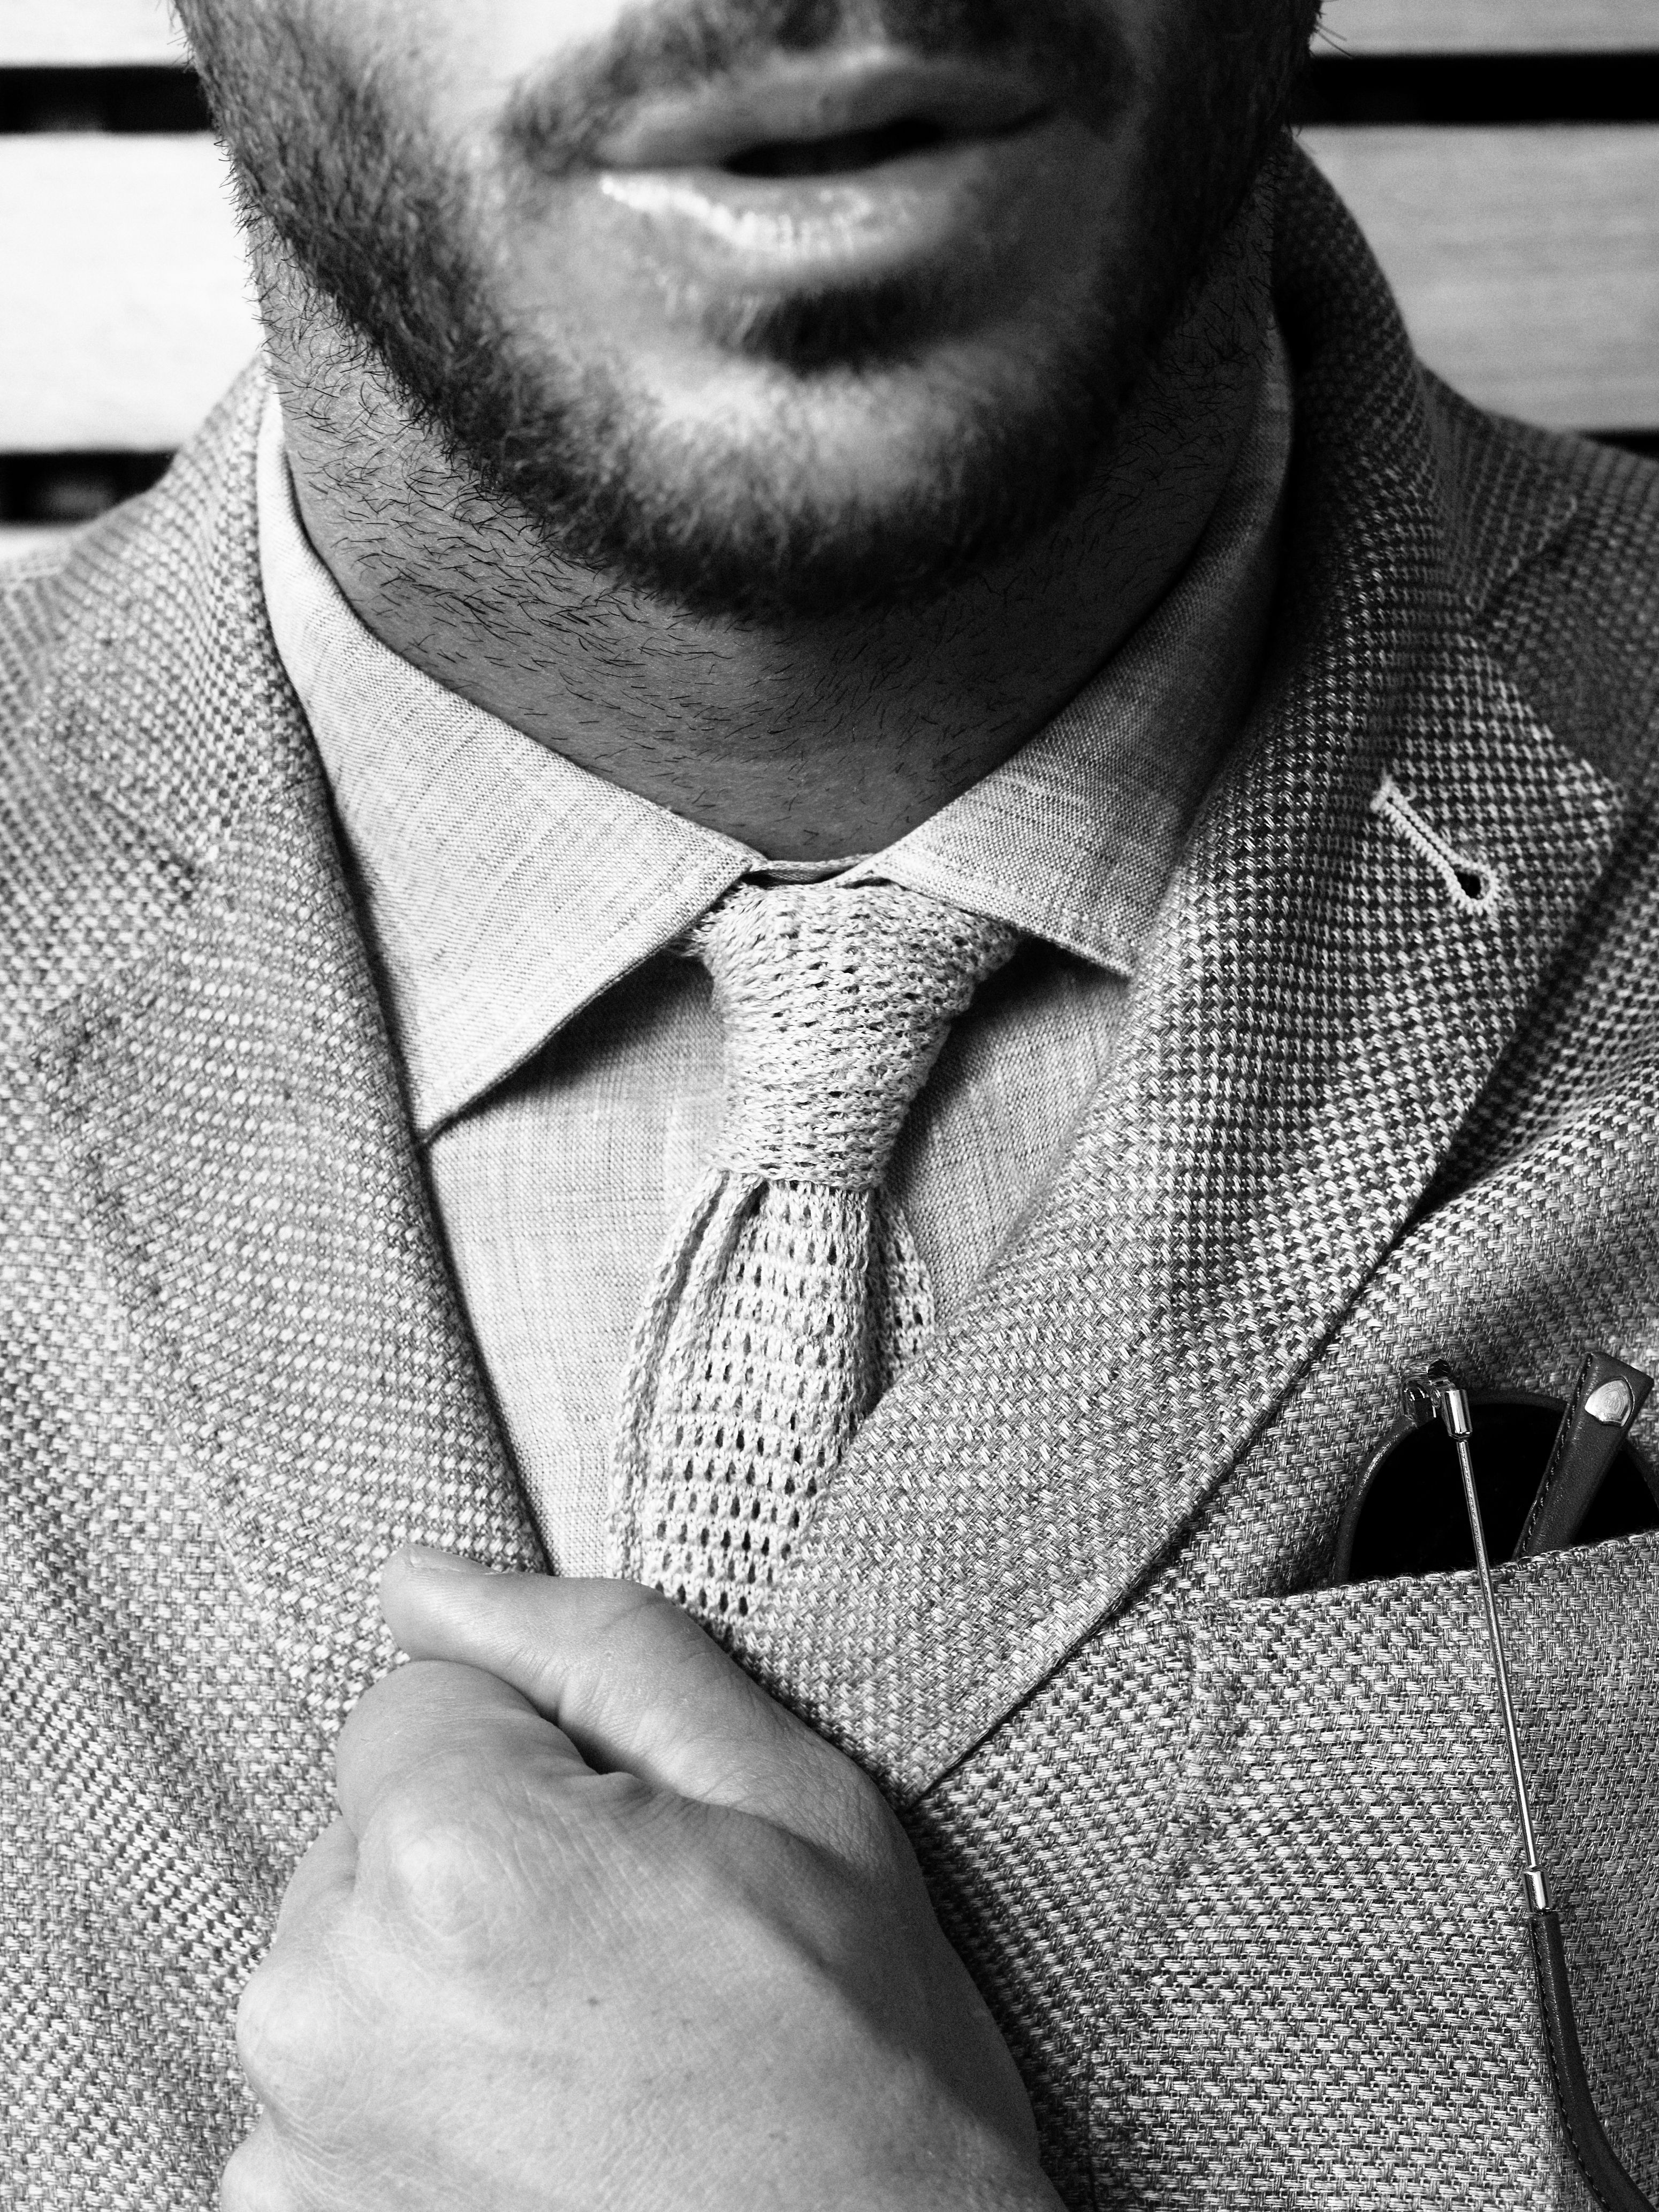 Massimo Dutti April Lookbook for Men. Spring Summer 2014 Collection. www.massimodutti.com